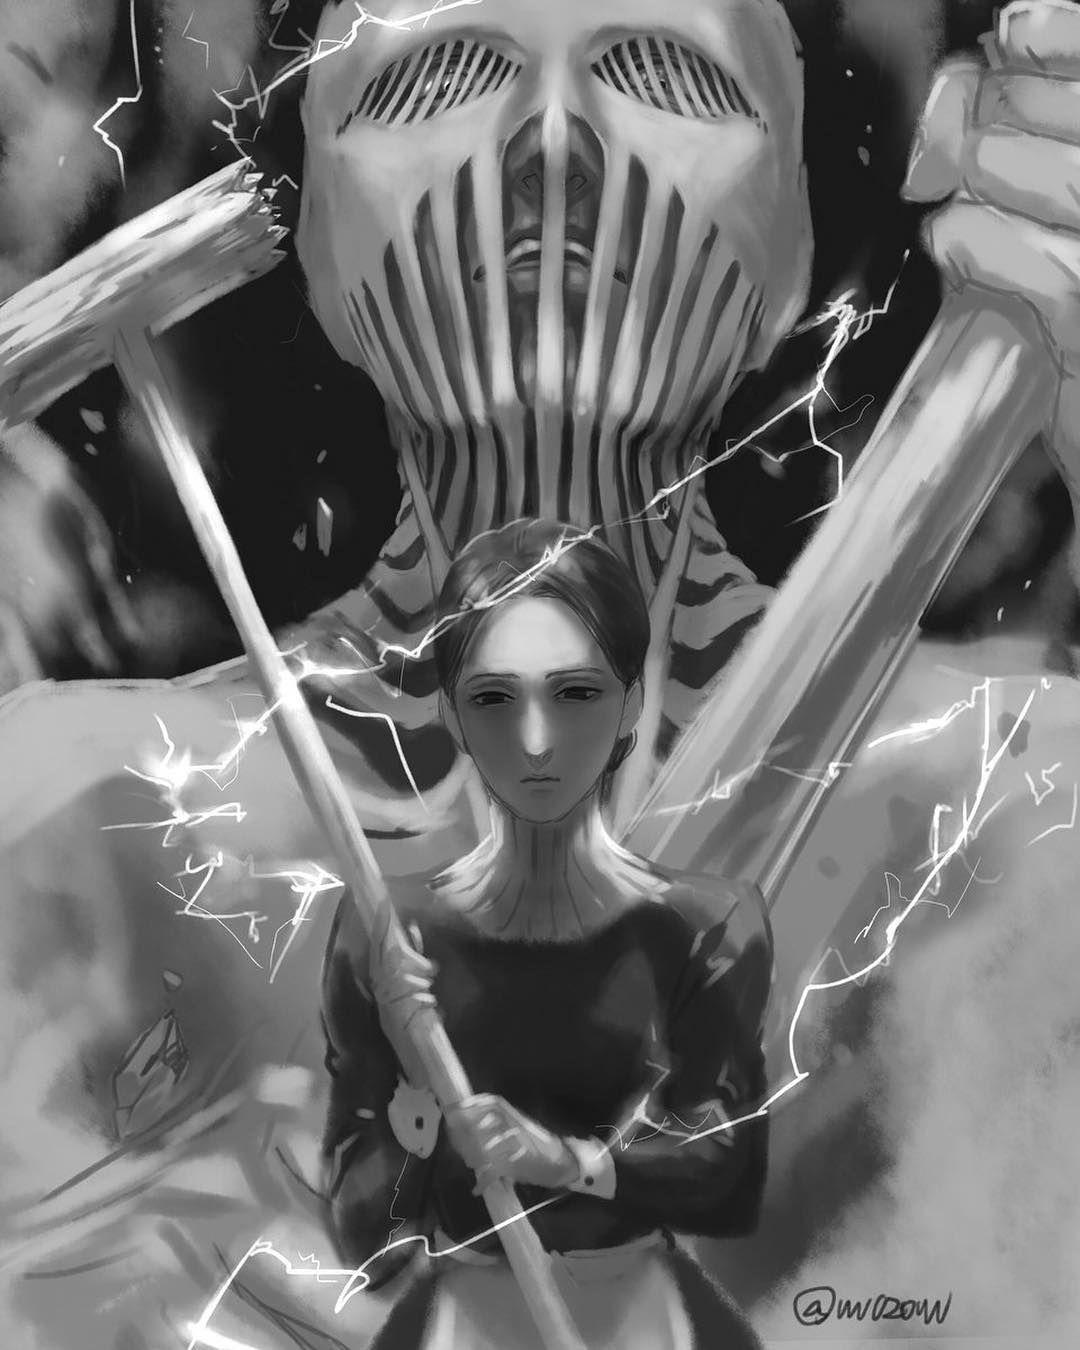 War Hammer Titan Fan Art Artist Vvv020vvv On Twitter Attack On Titan Shingeki No Kyojin Attack On Titan Animasi Manga